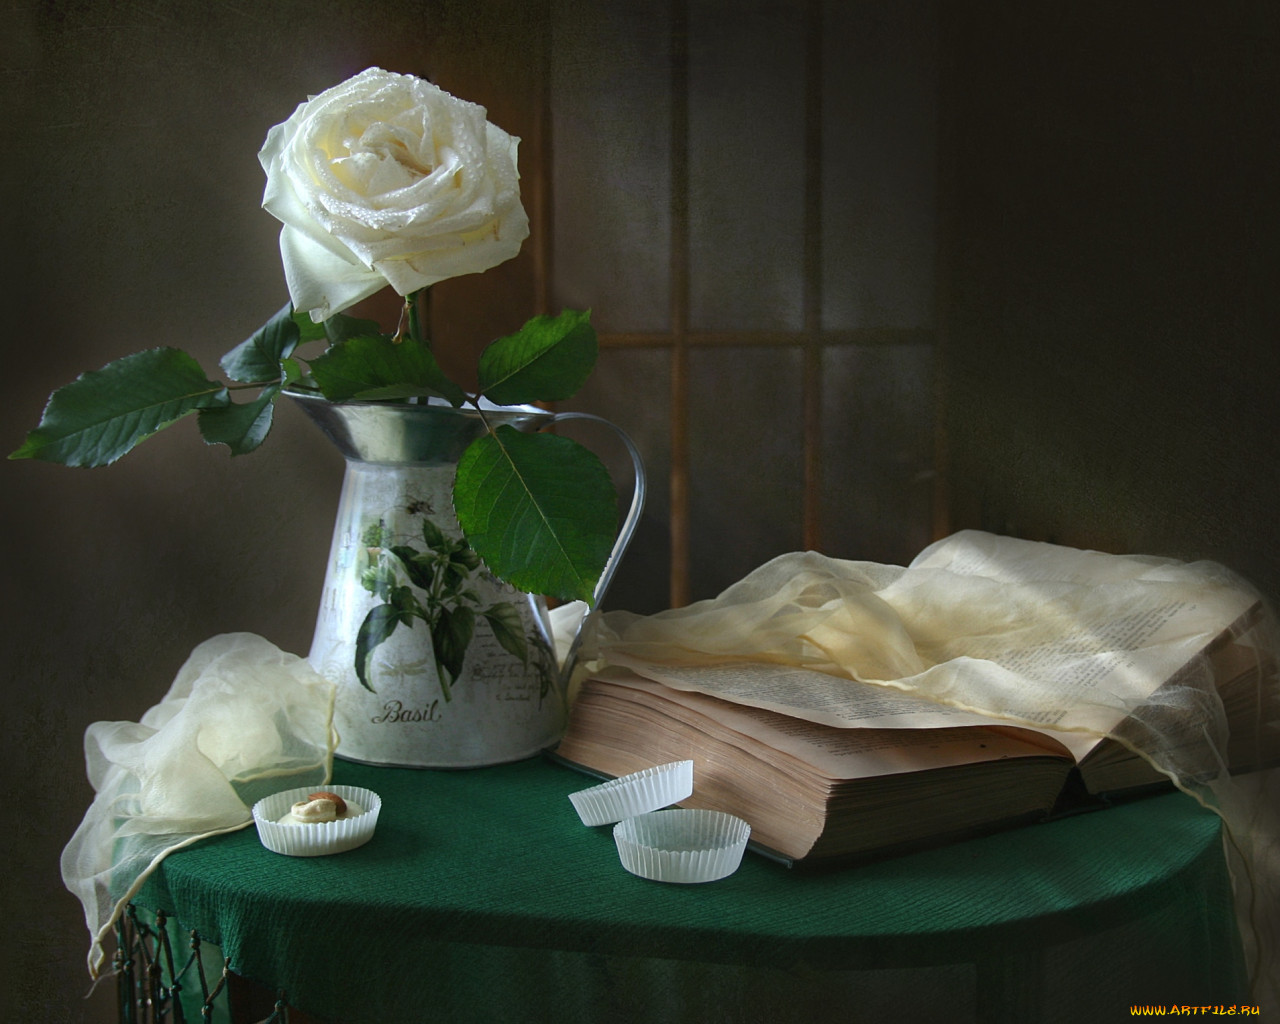 http://i.artfile.ru/1280x1024_792048_%5Bwww.ArtFile.ru%5D.jpg